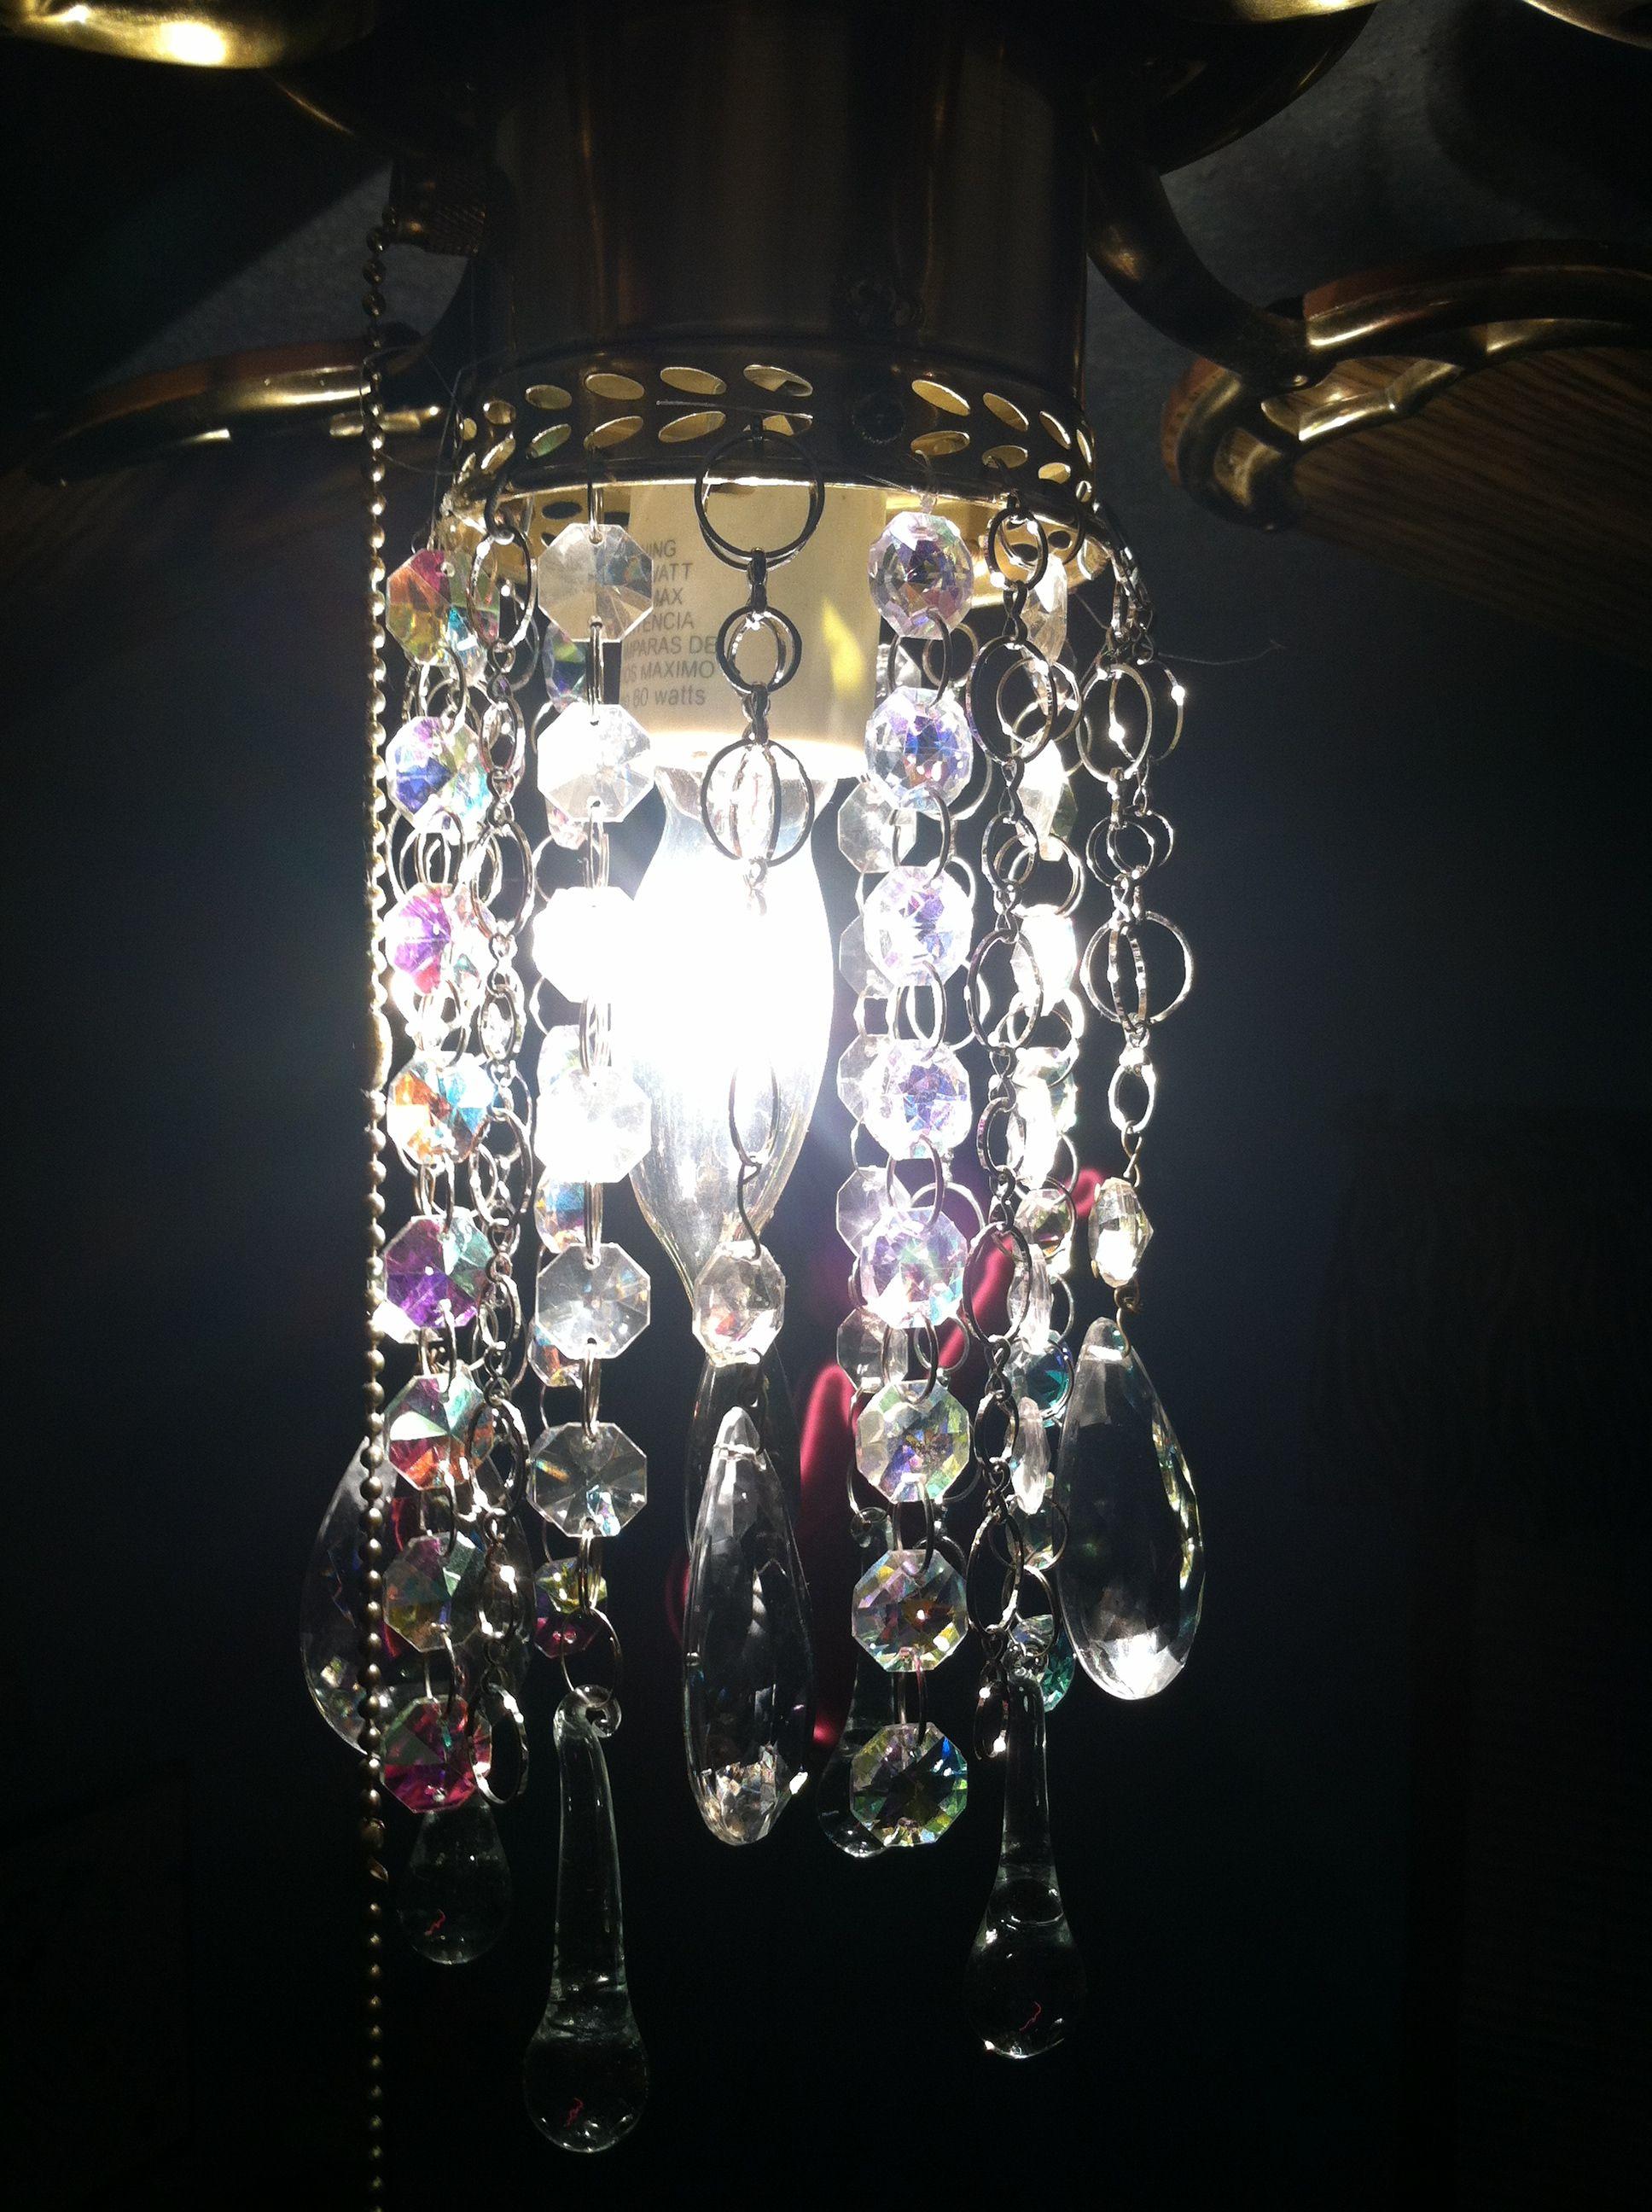 Fandelier. It's A Ceiling Fan Made To Also Resemble A